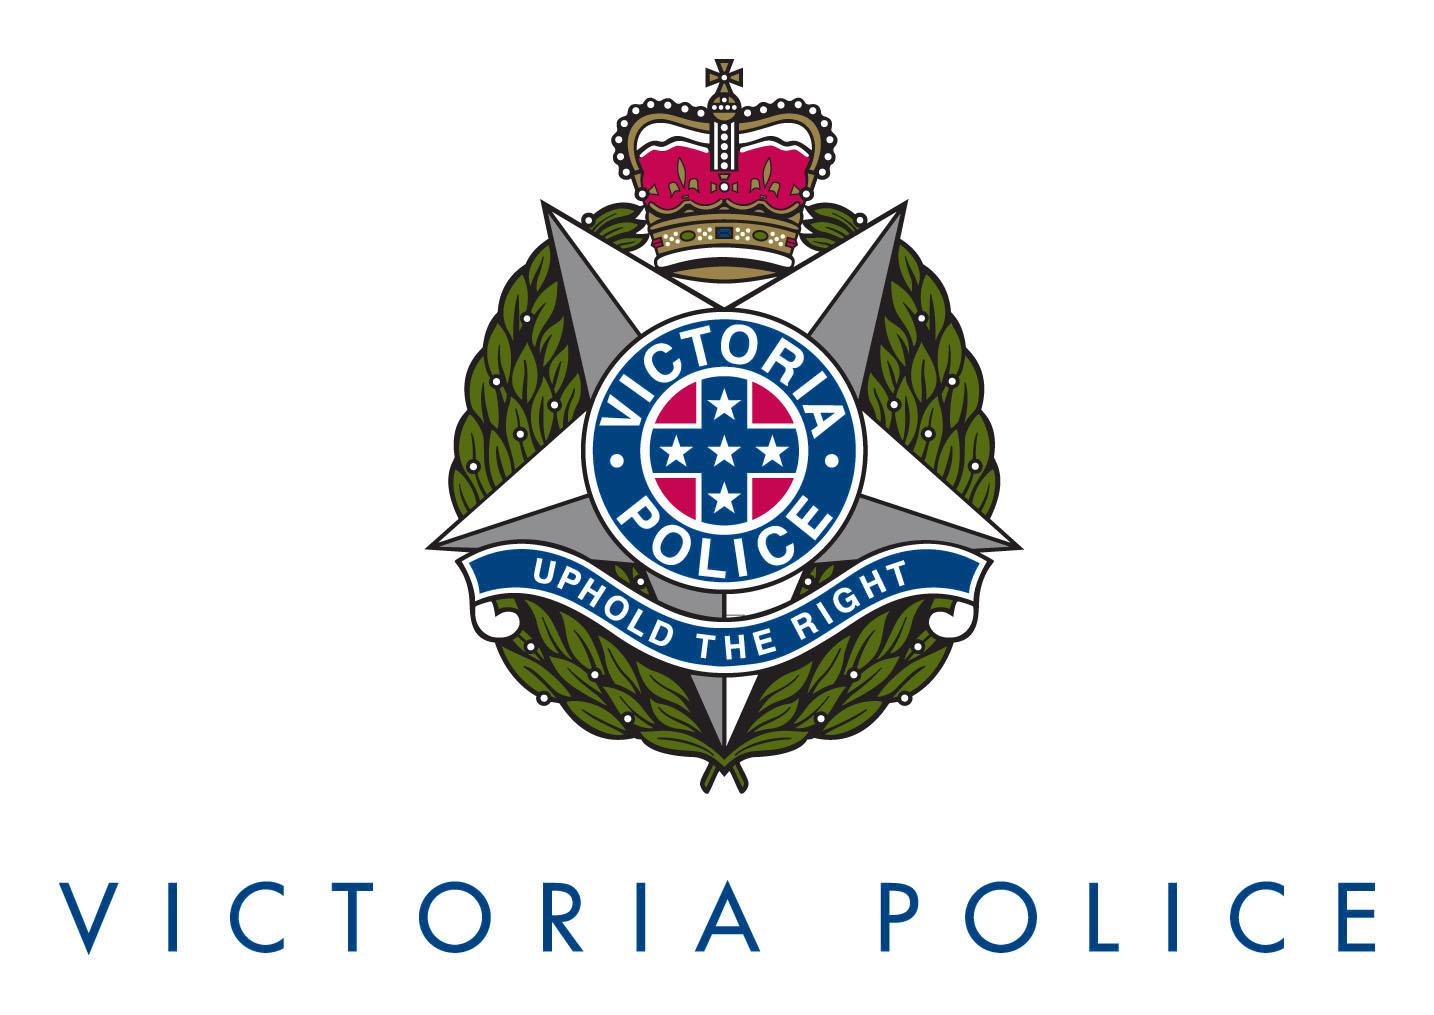 Victorian Police logo